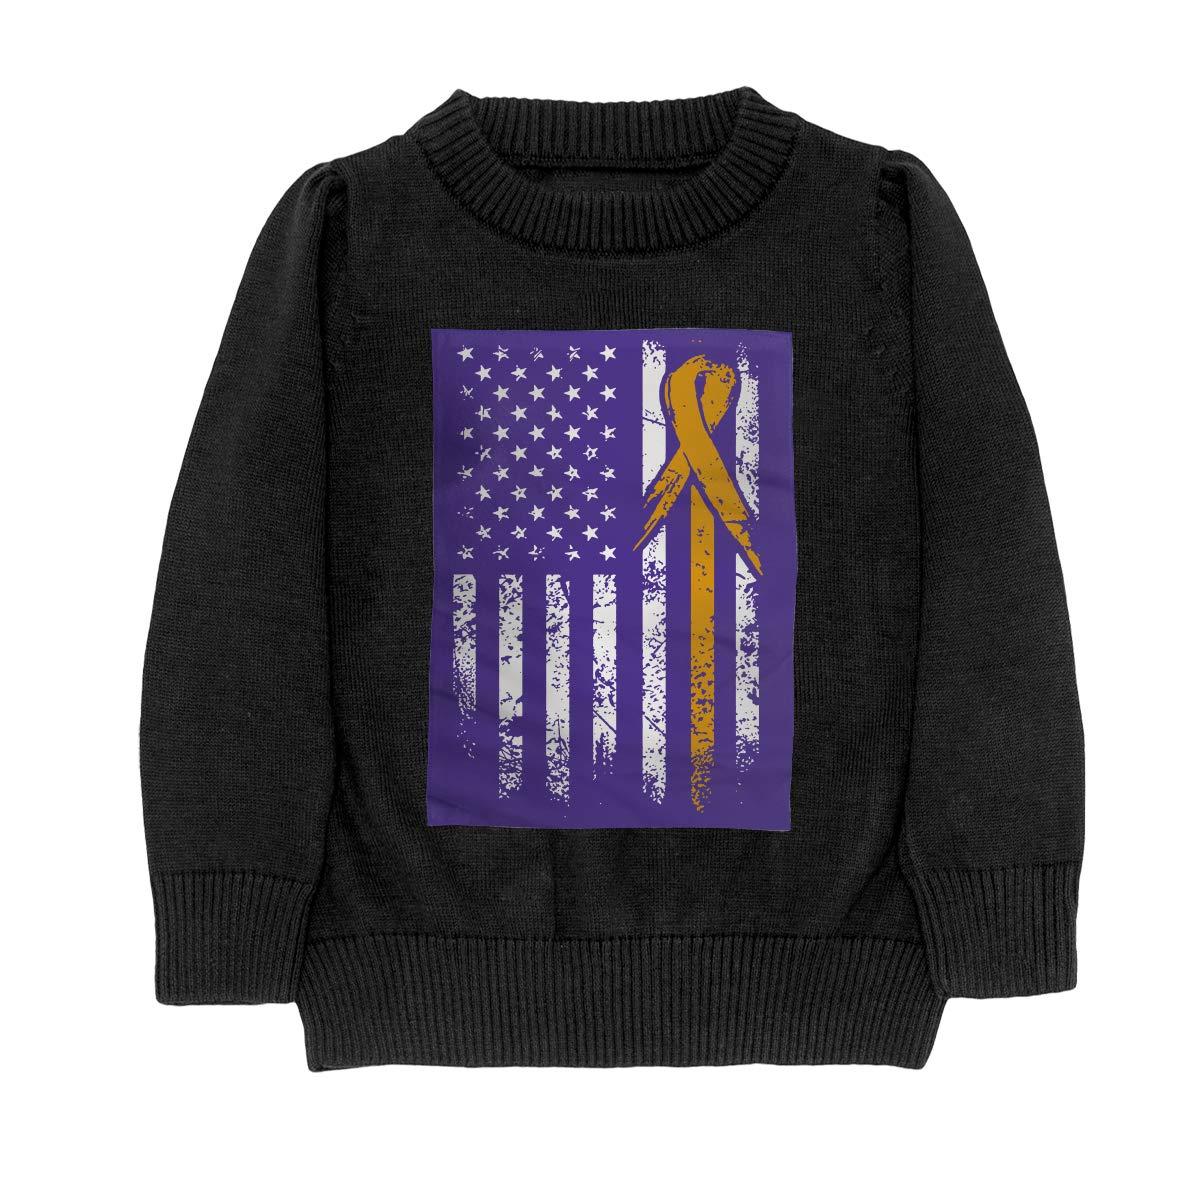 WWTBBJ-B Leukemia Awareness American Flag Fashion Teenager Boys Girls Unisex Sweater Keep Warm